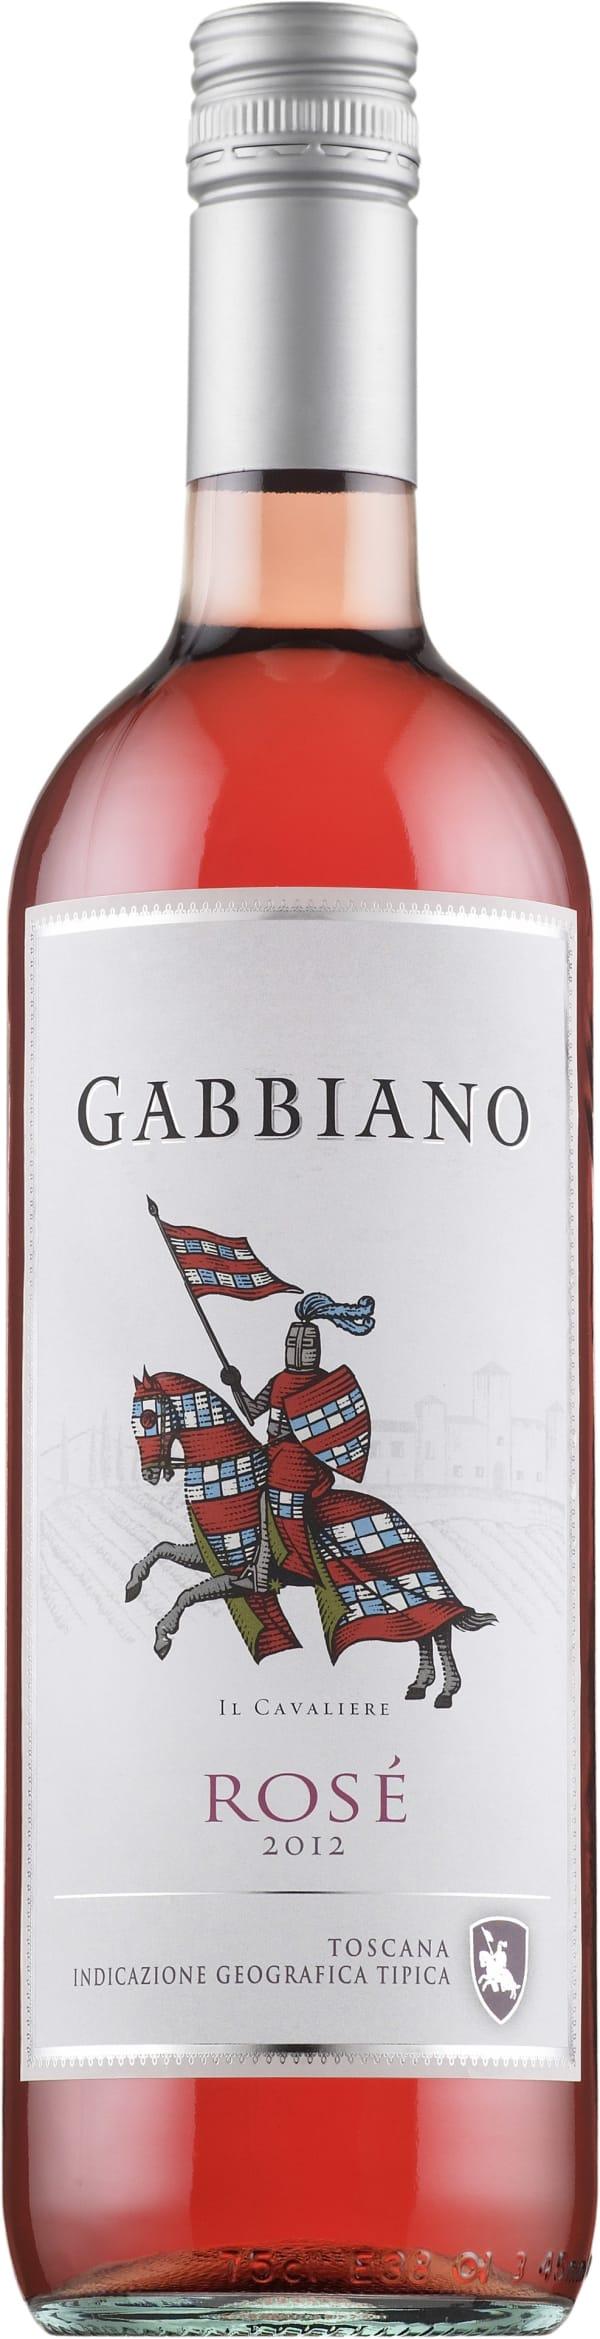 Gabbiano Rosé 2014